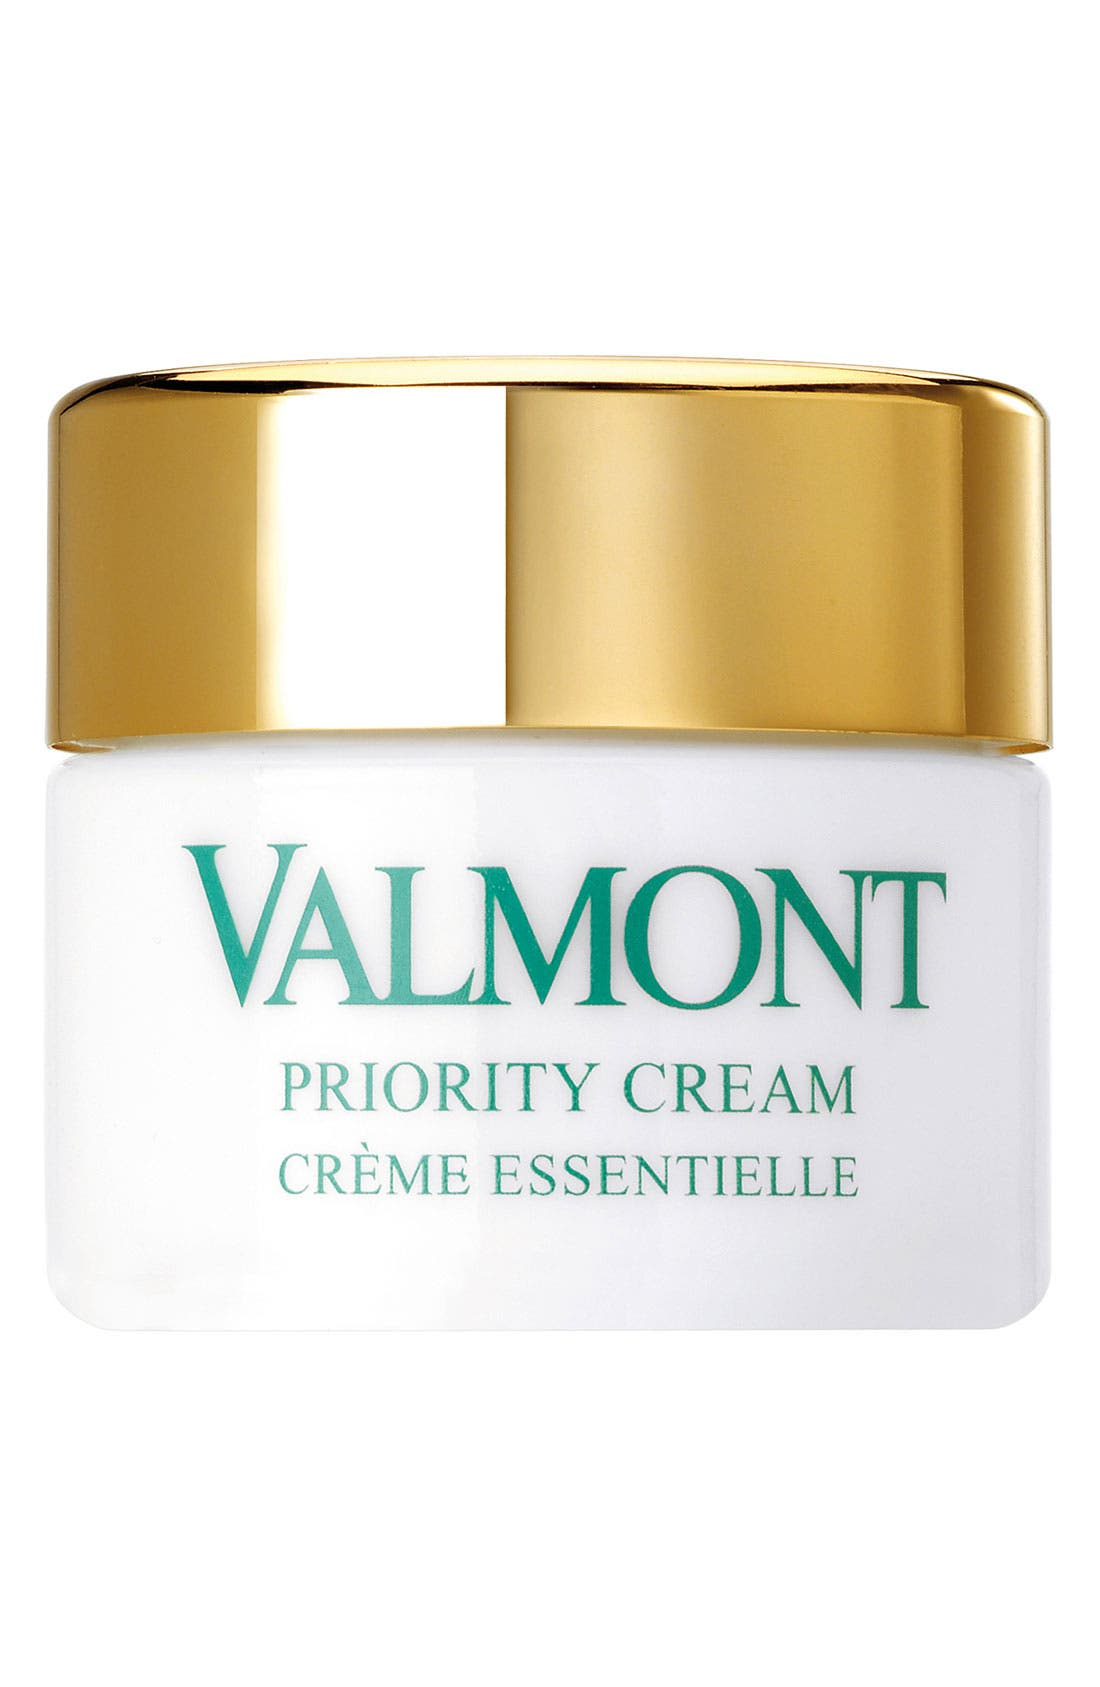 Valmont 'Priority' Cream